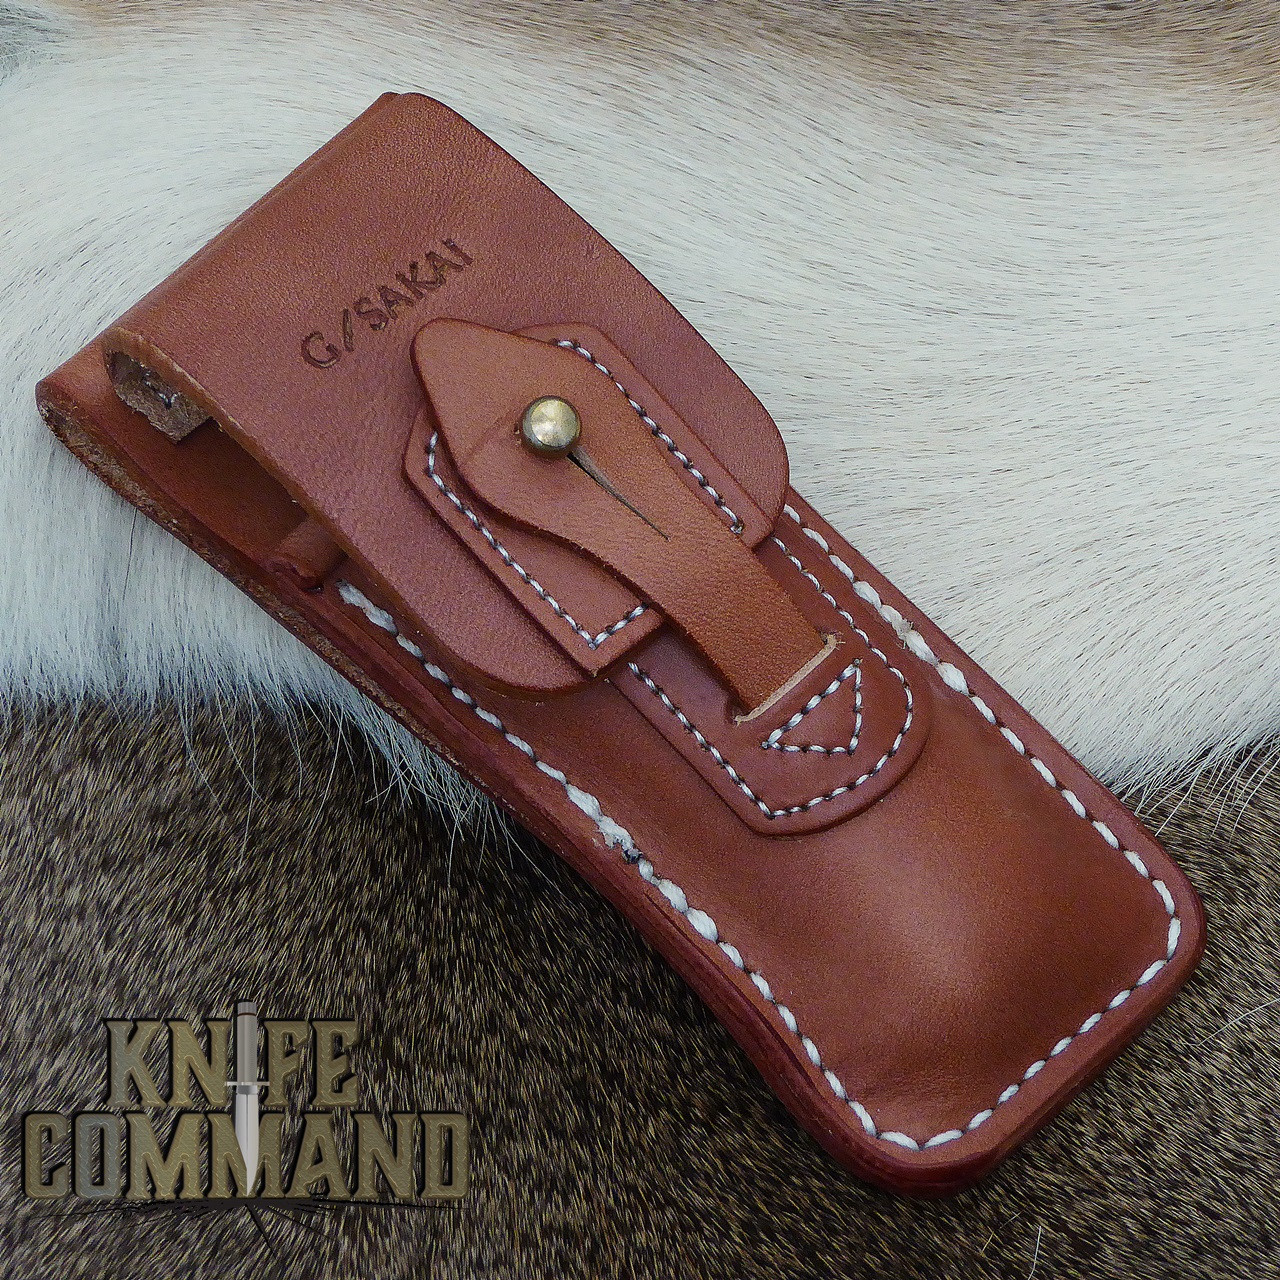 Custom leather belt sheath.